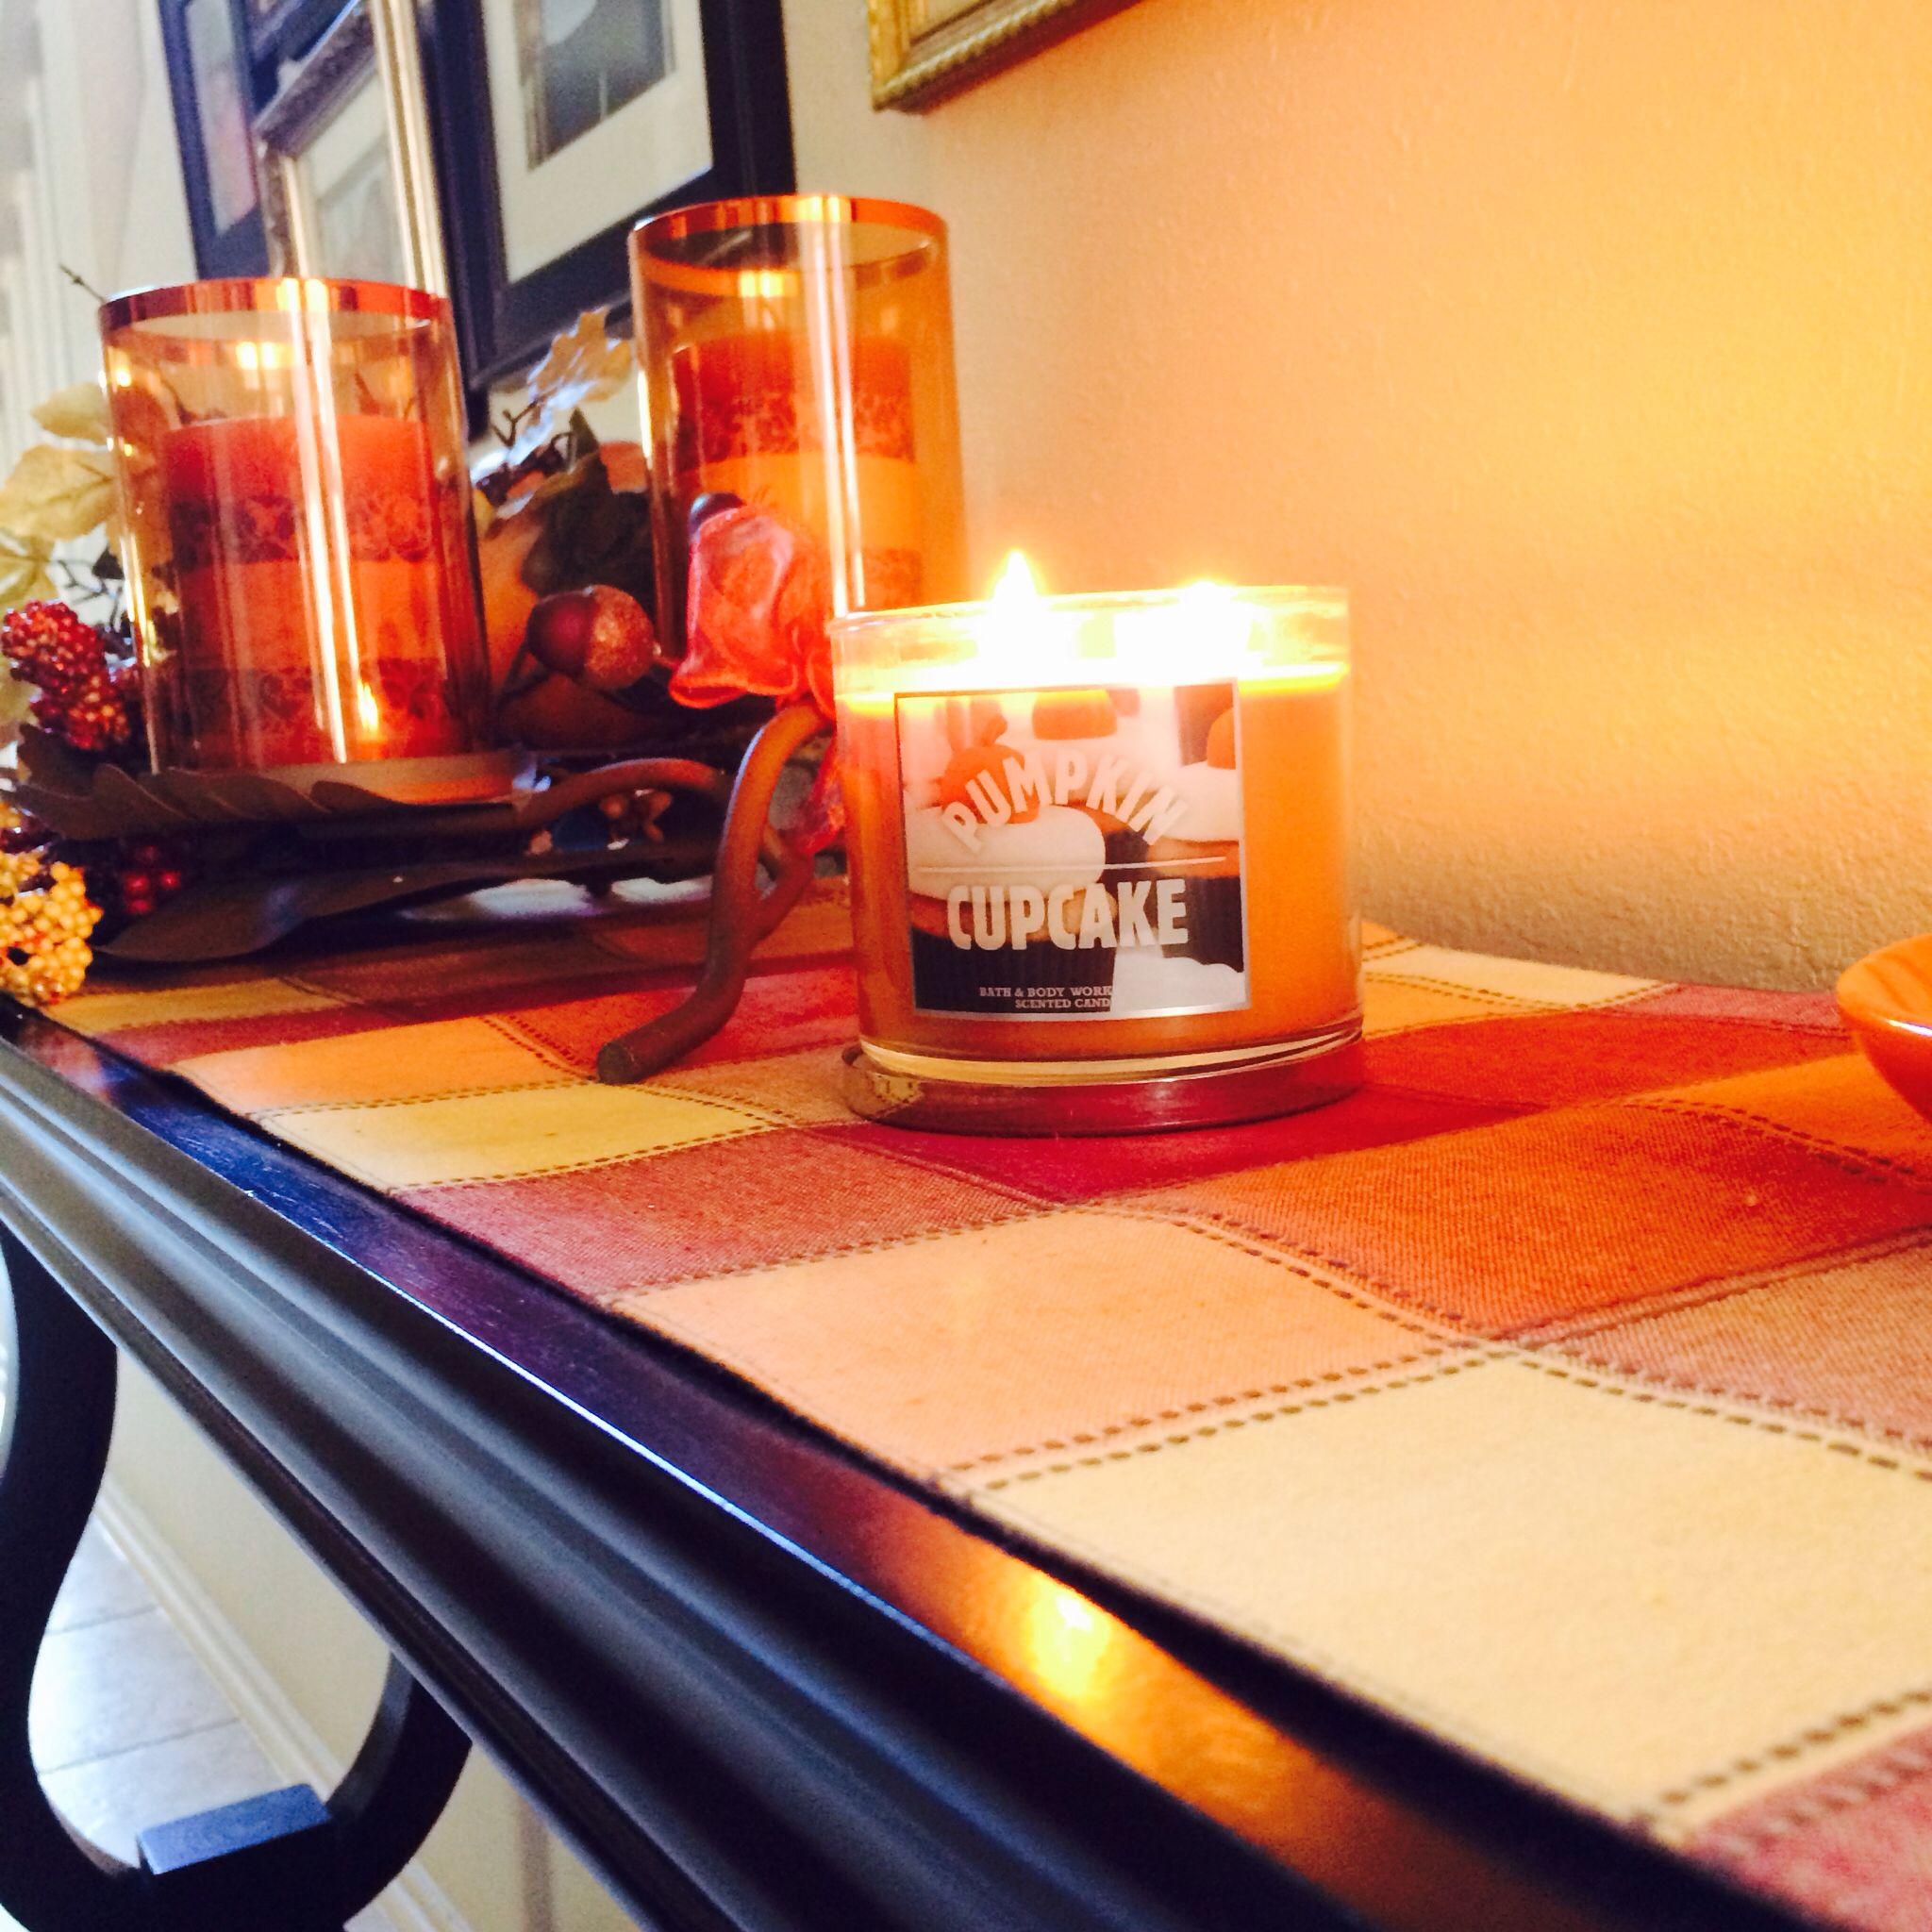 Favorite candle! Pumpkin cupcake!! Smells like heaven